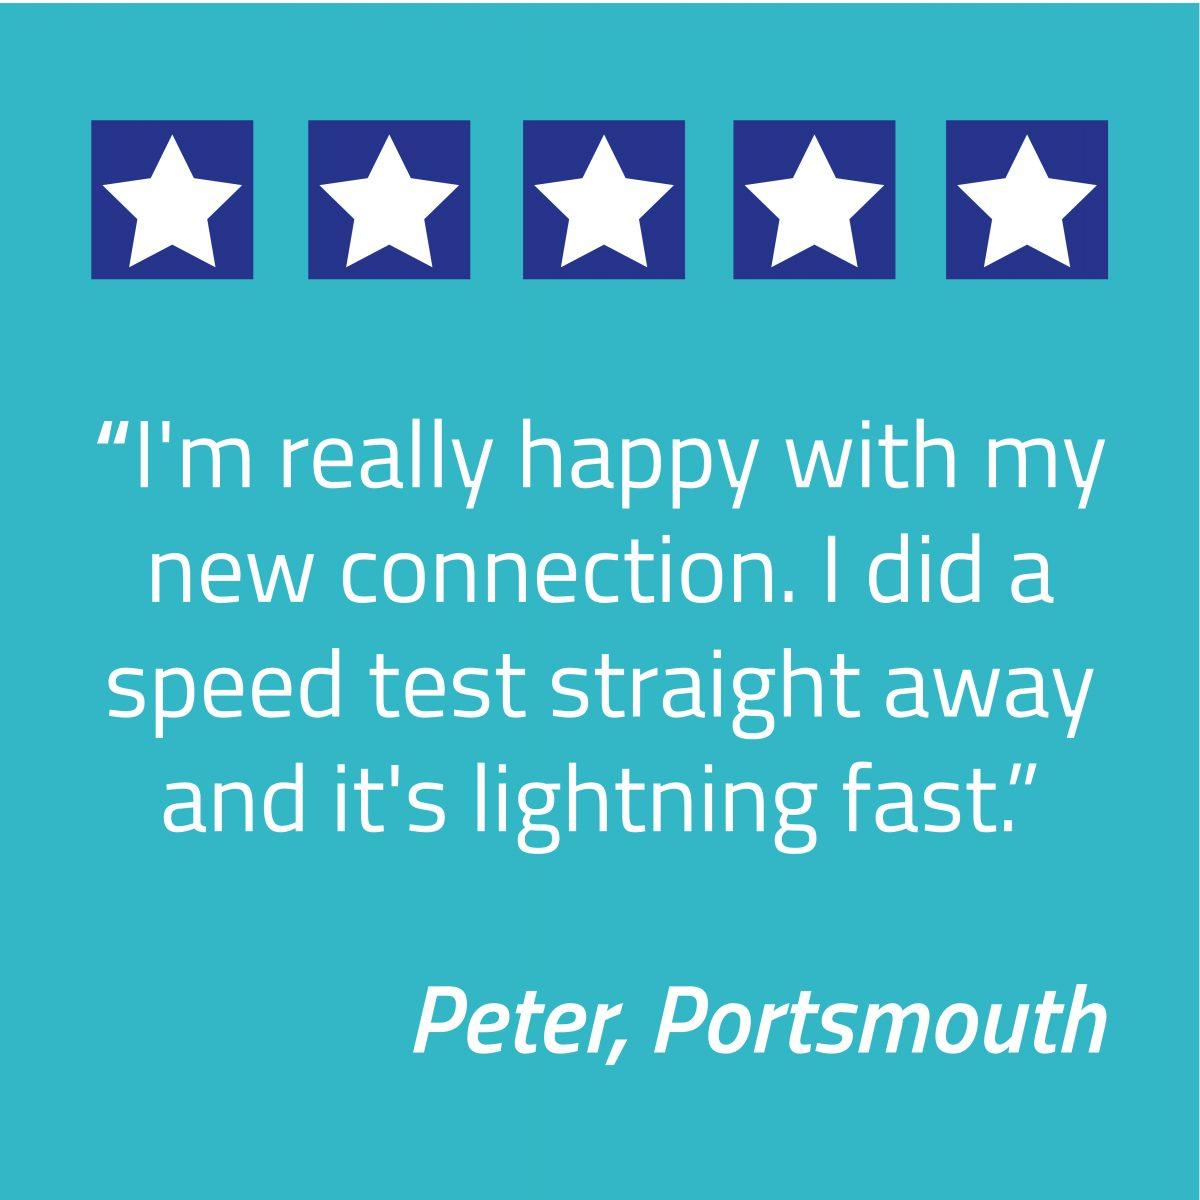 100th customer Portsmouth